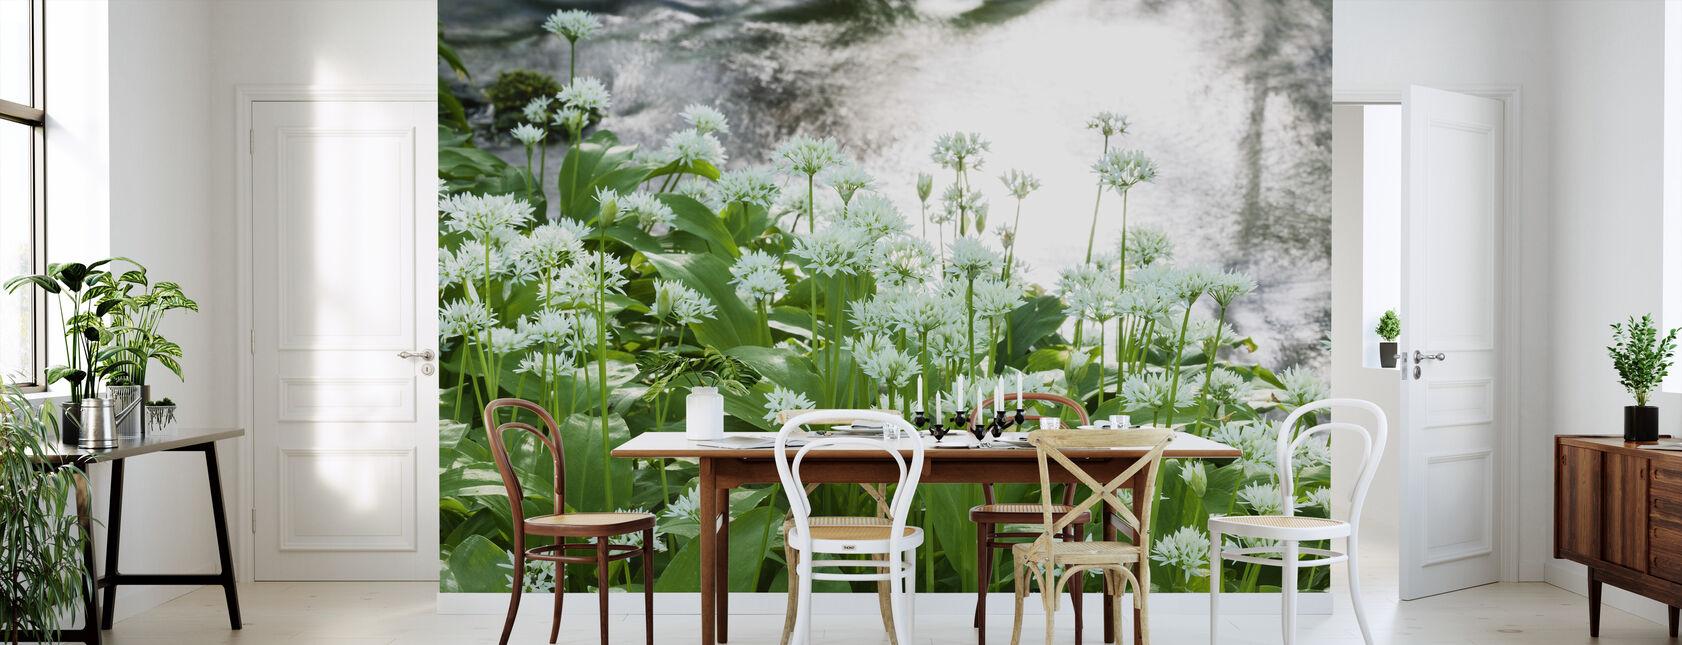 Ramson - Wallpaper - Kitchen